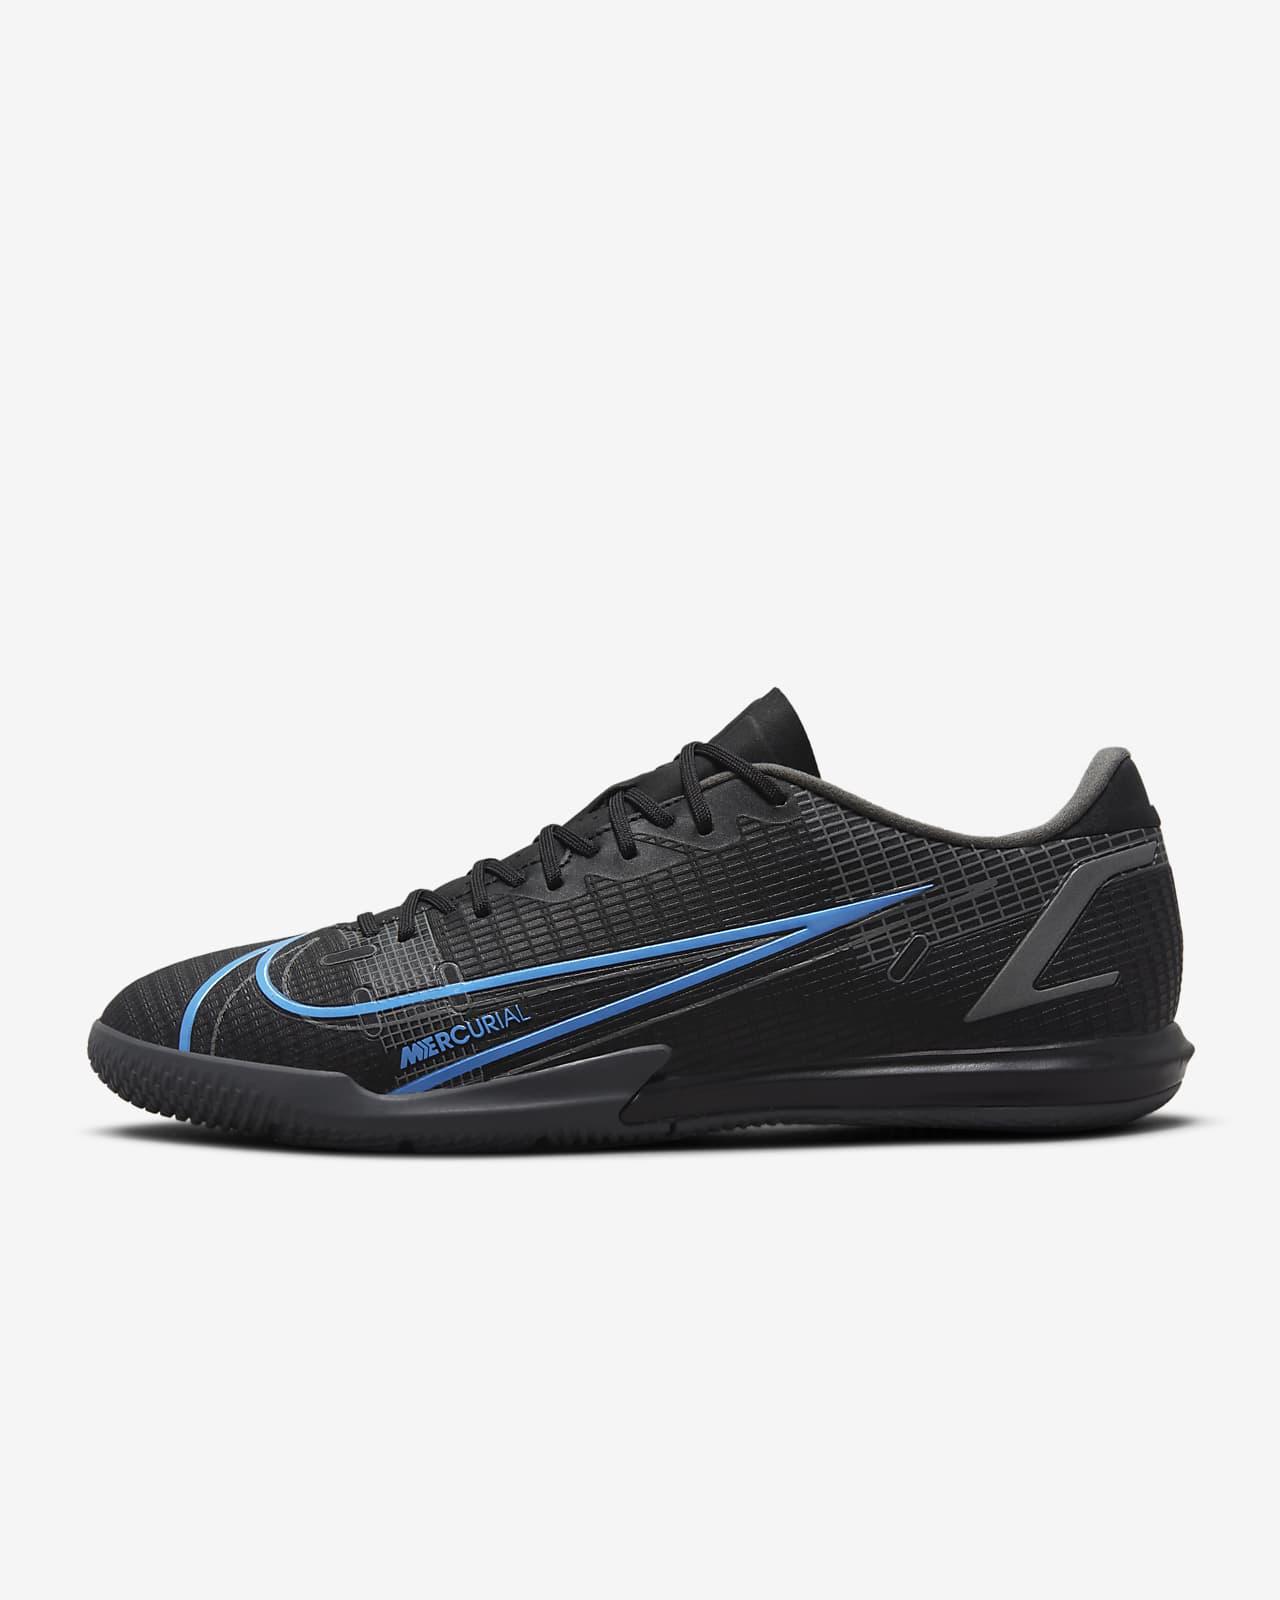 Calzado de fútbol para cancha cubierta Nike Mercurial Vapor 14 Academy IC